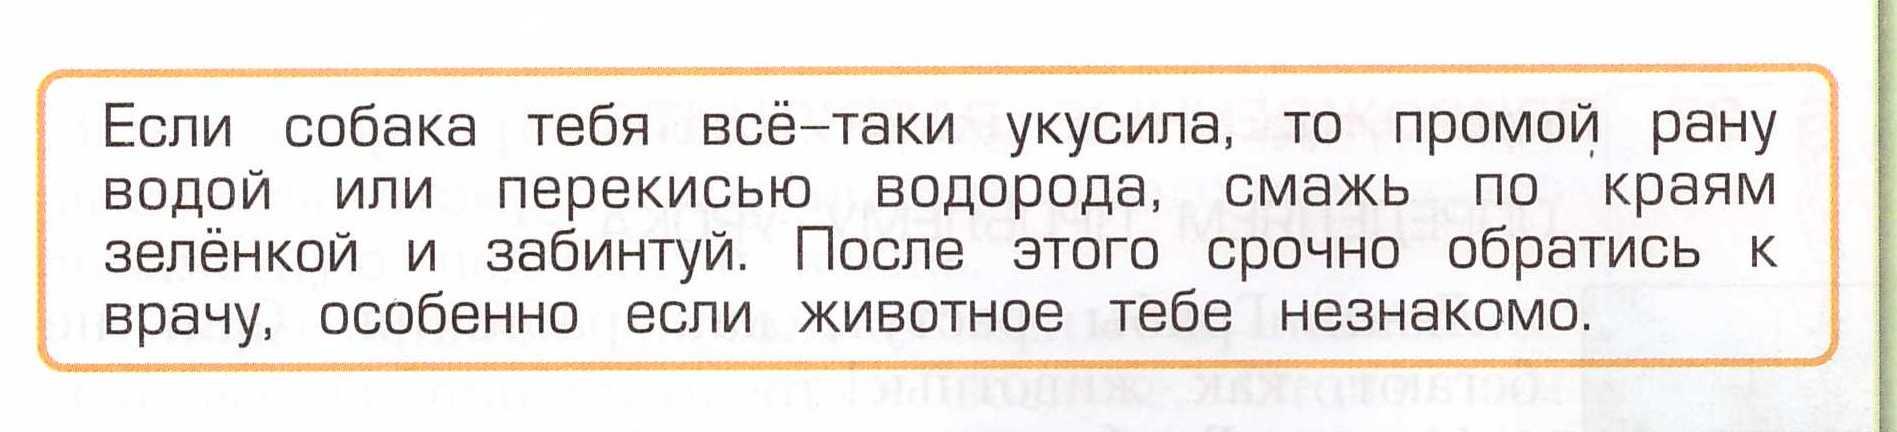 C:\Users\Наталья\AppData\Local\Microsoft\Windows\Temporary Internet Files\Content.Word\23.jpeg